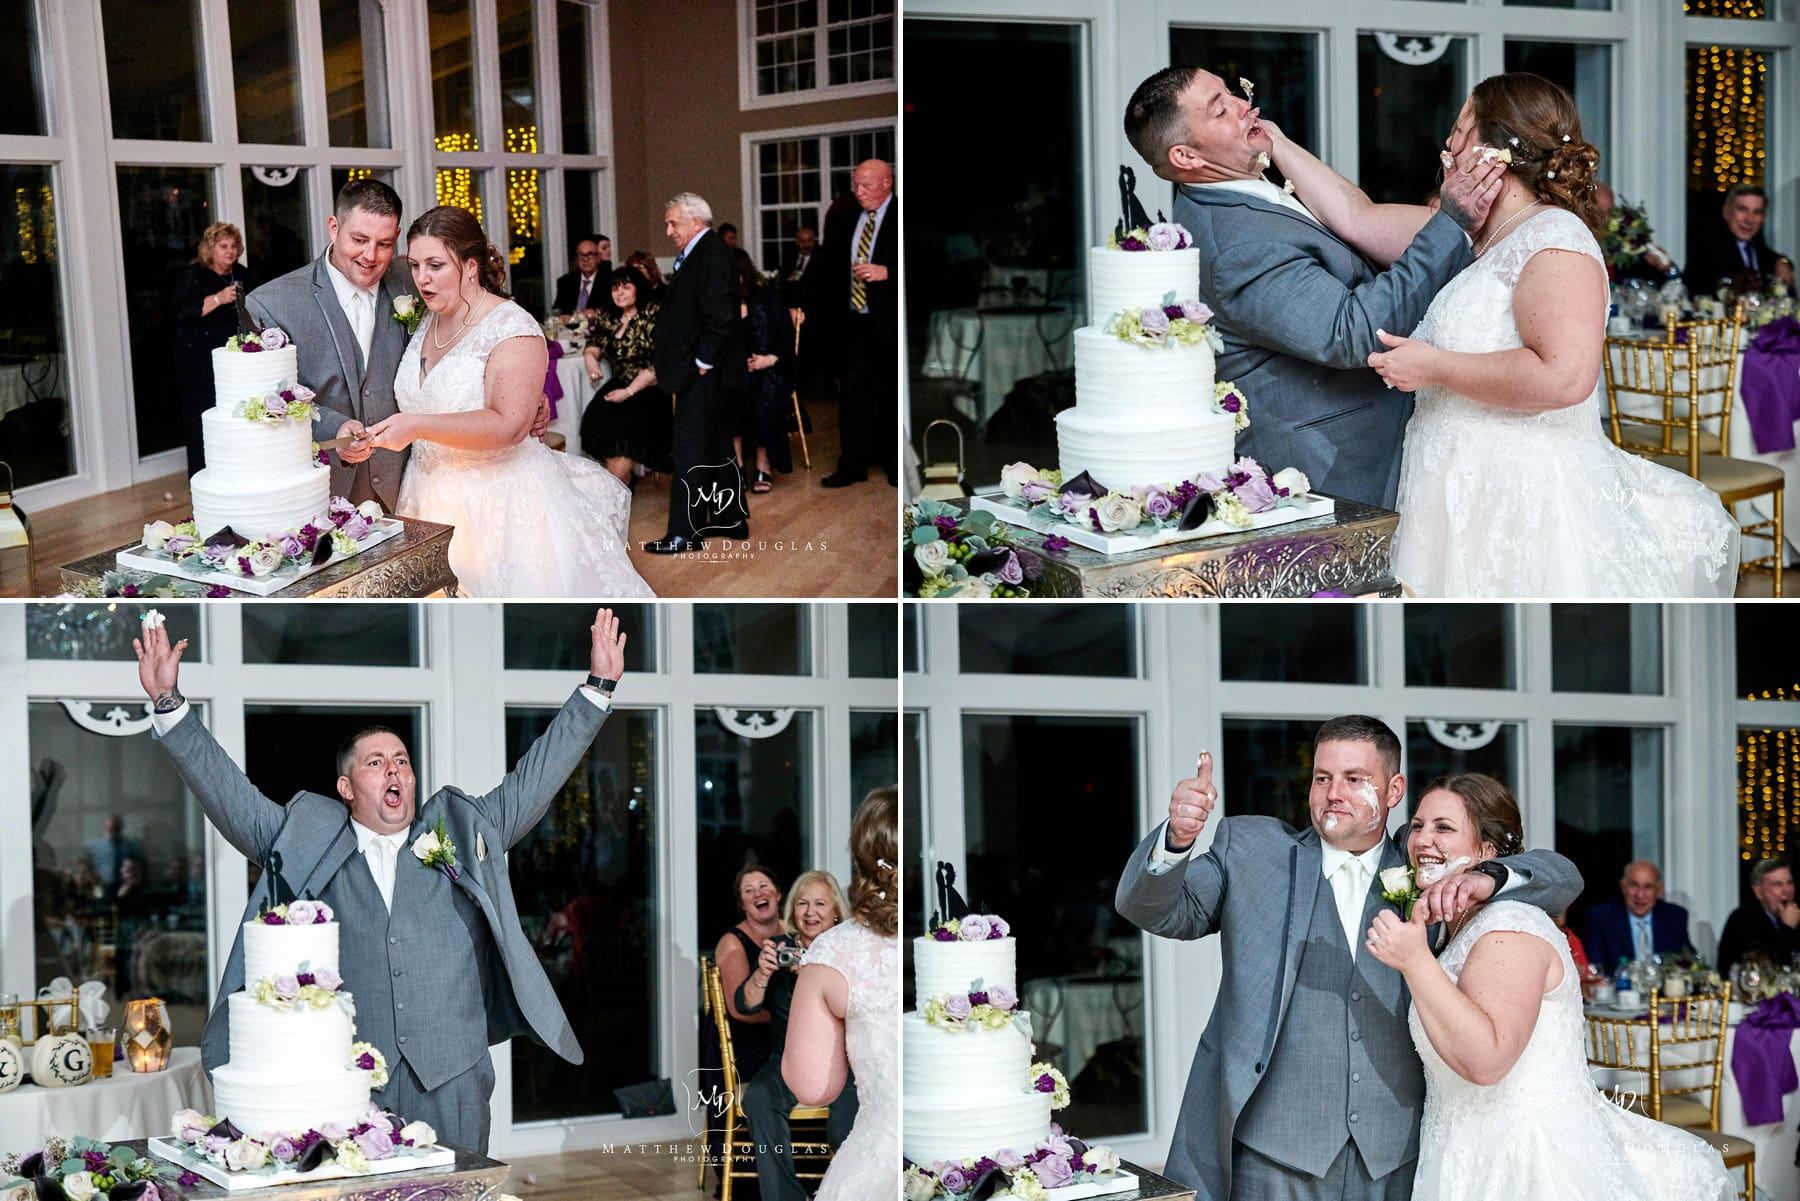 Skyview Golf club wedding cake cutting and smashing photos